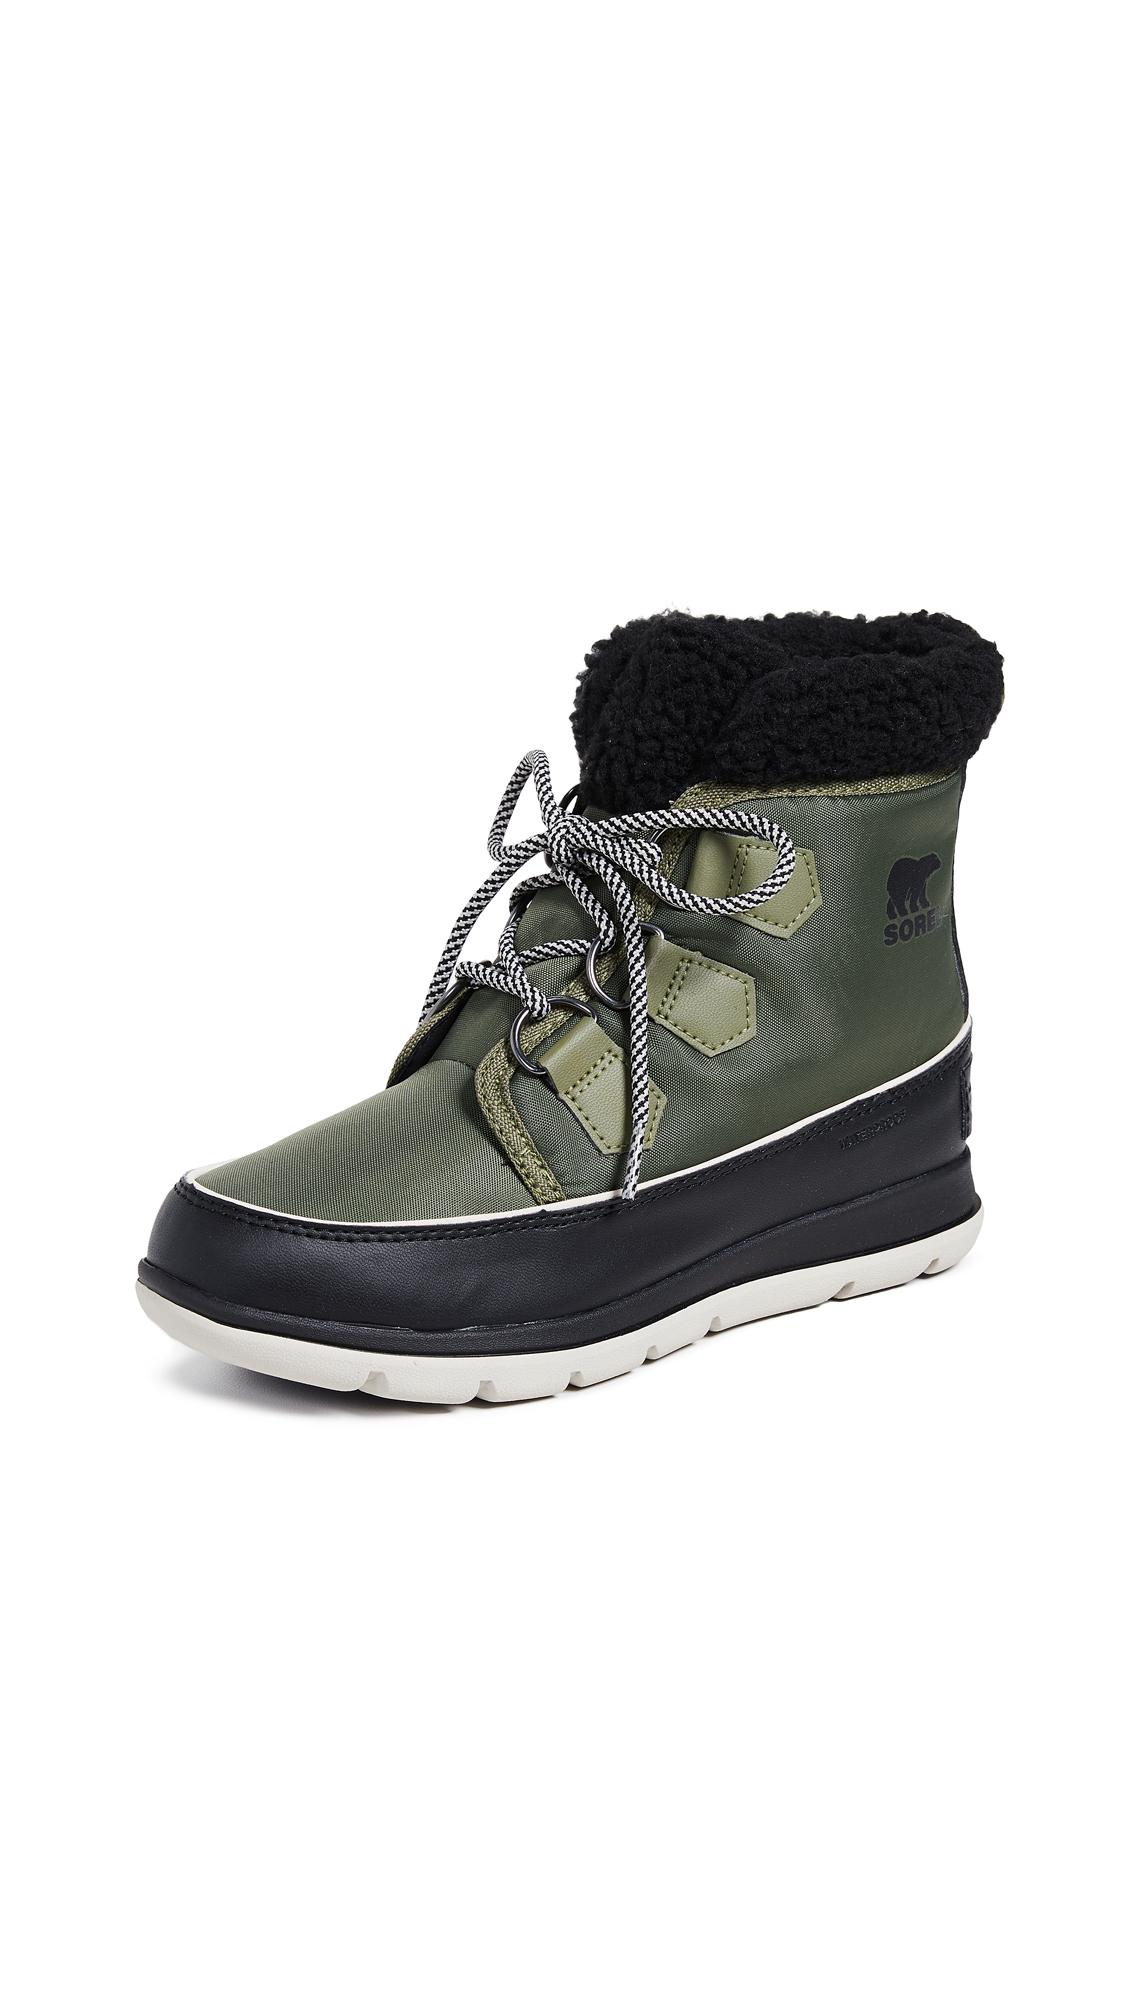 Sorel Sorel Explorer Carnival Boots - Hiker Green/Black